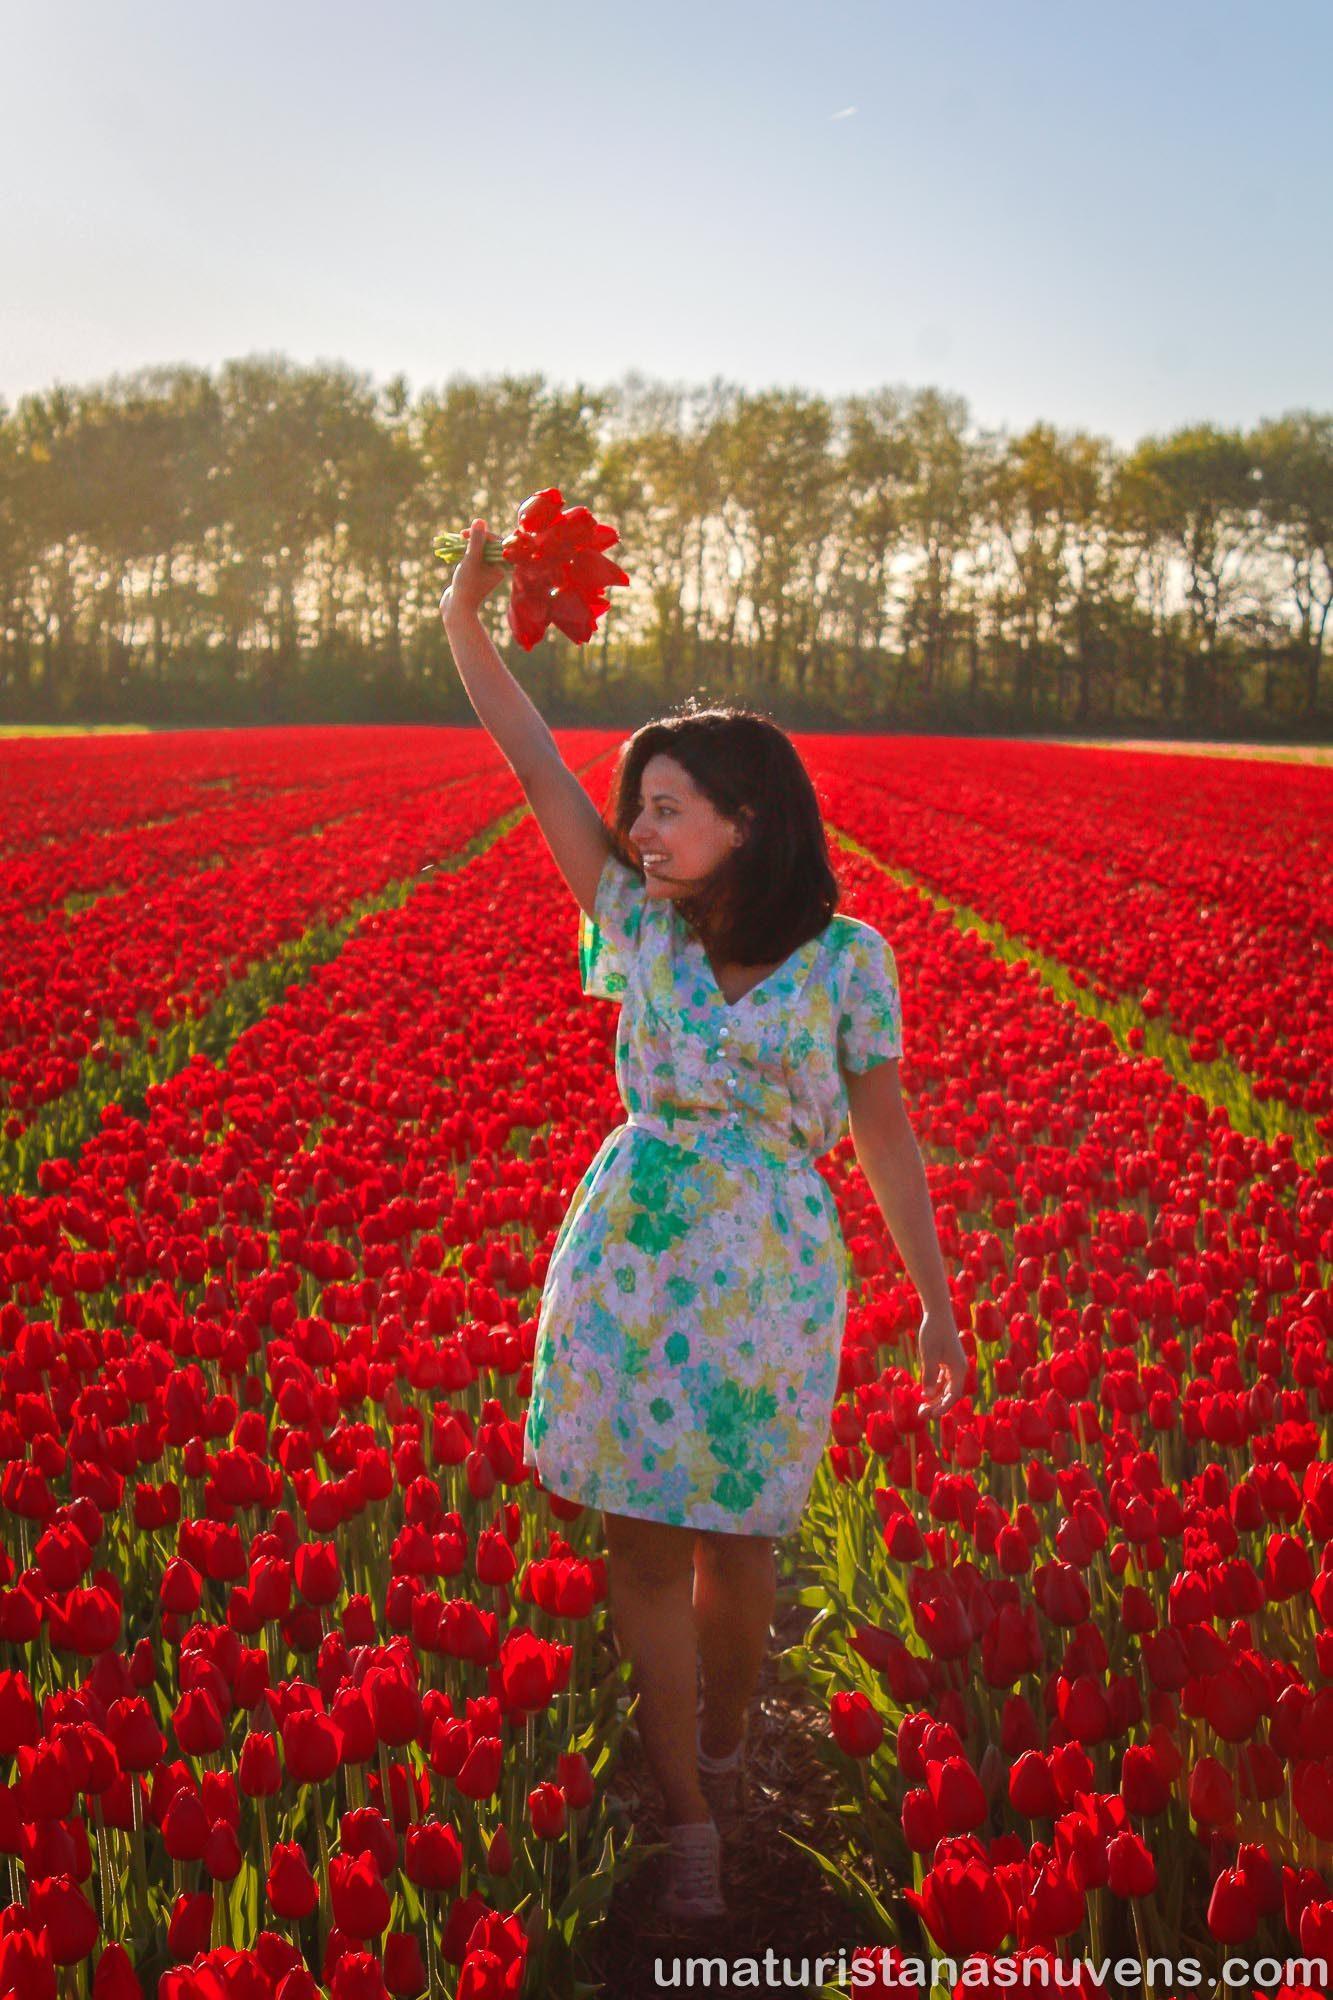 Campos de tulipa - Holanda - keukenhof